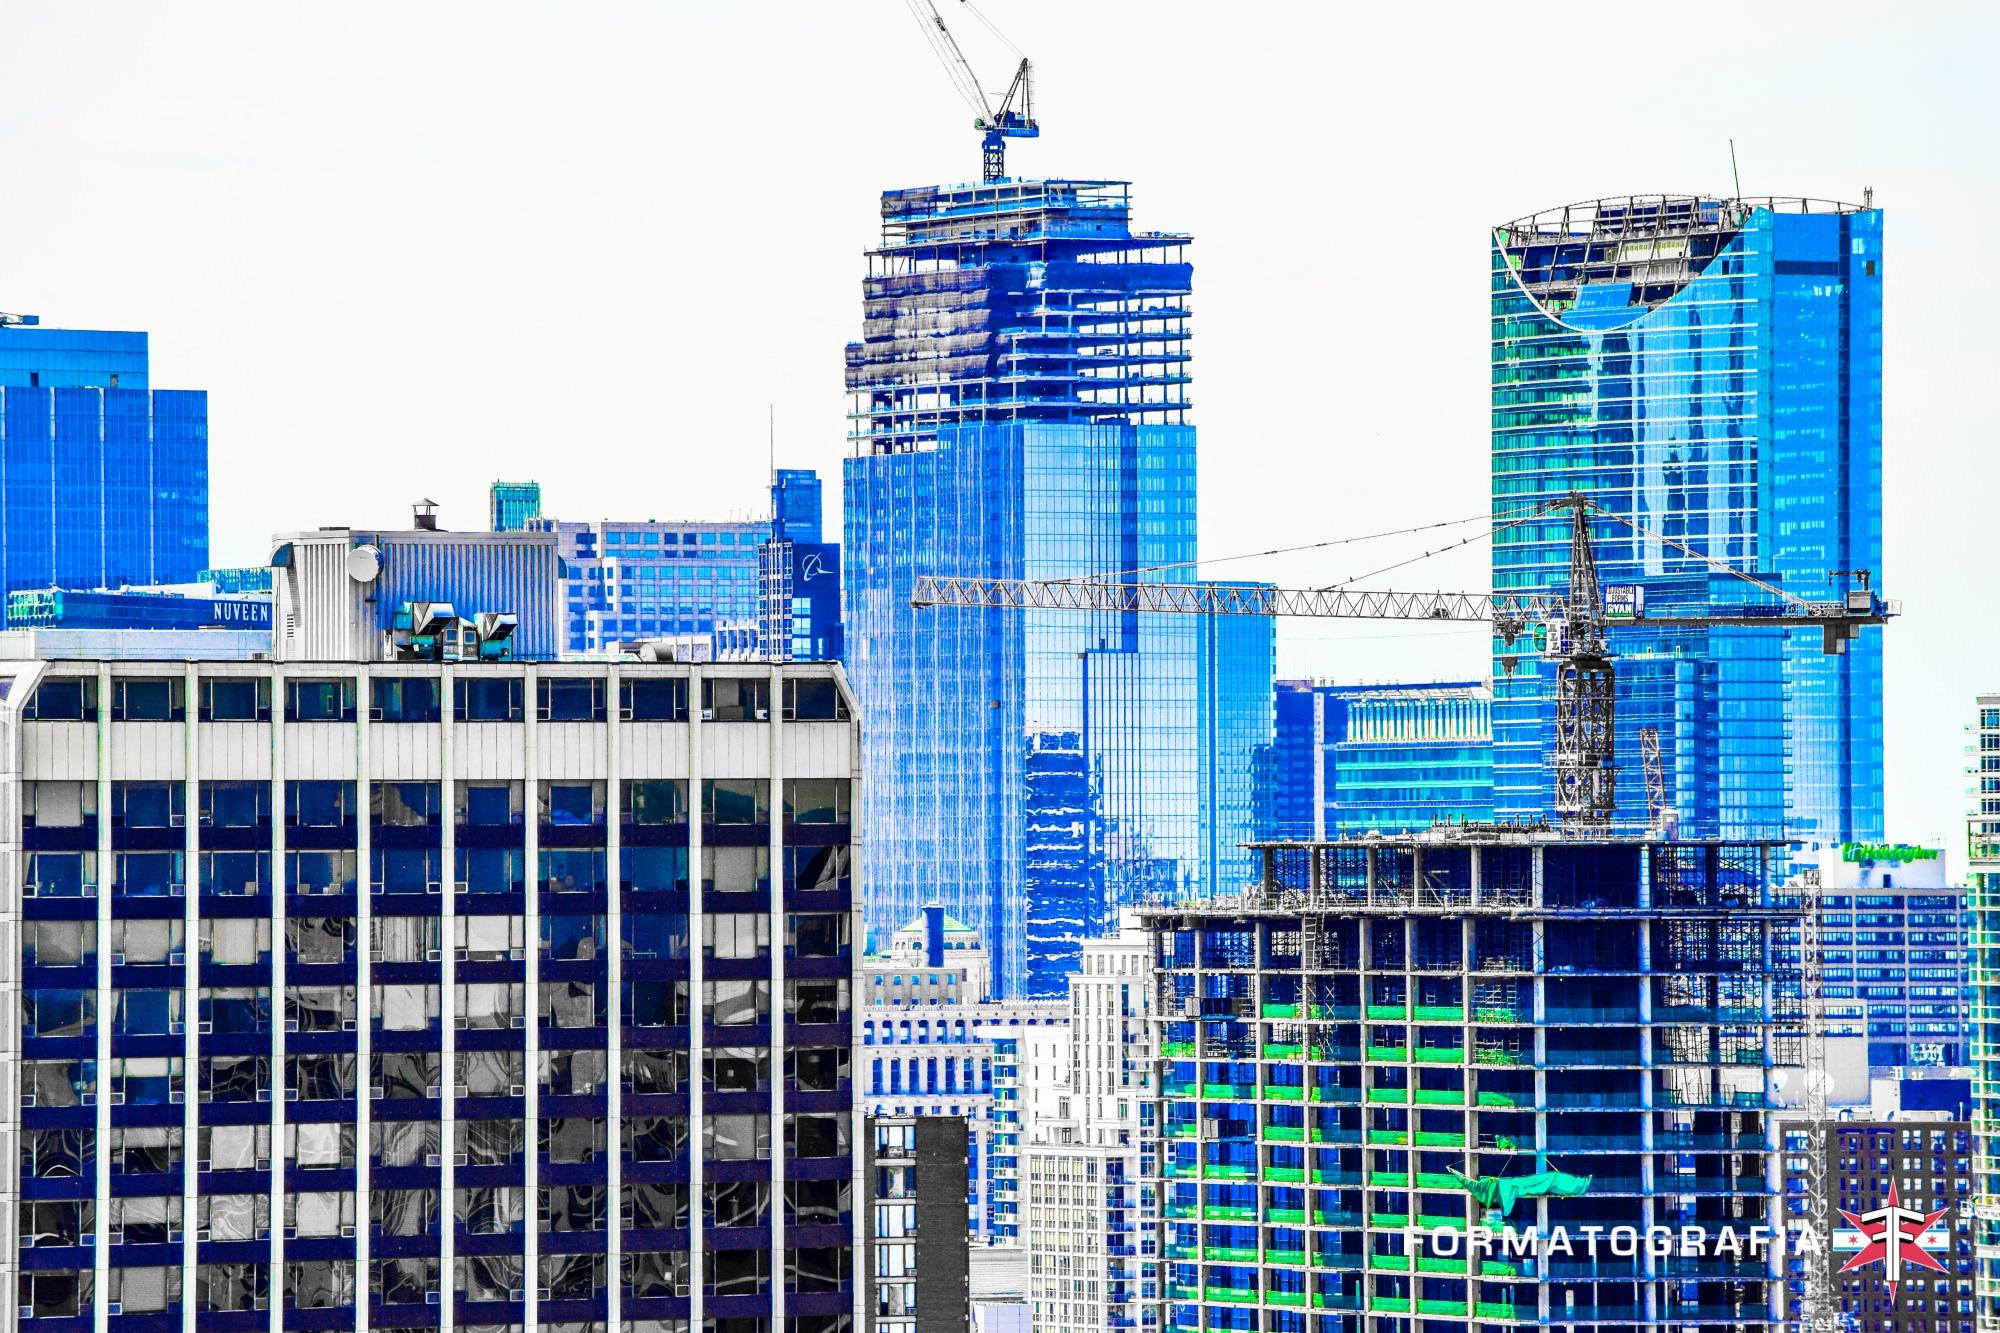 eric formato chicago photographer fall update city architecture shotsDSC_0673-4.jpg